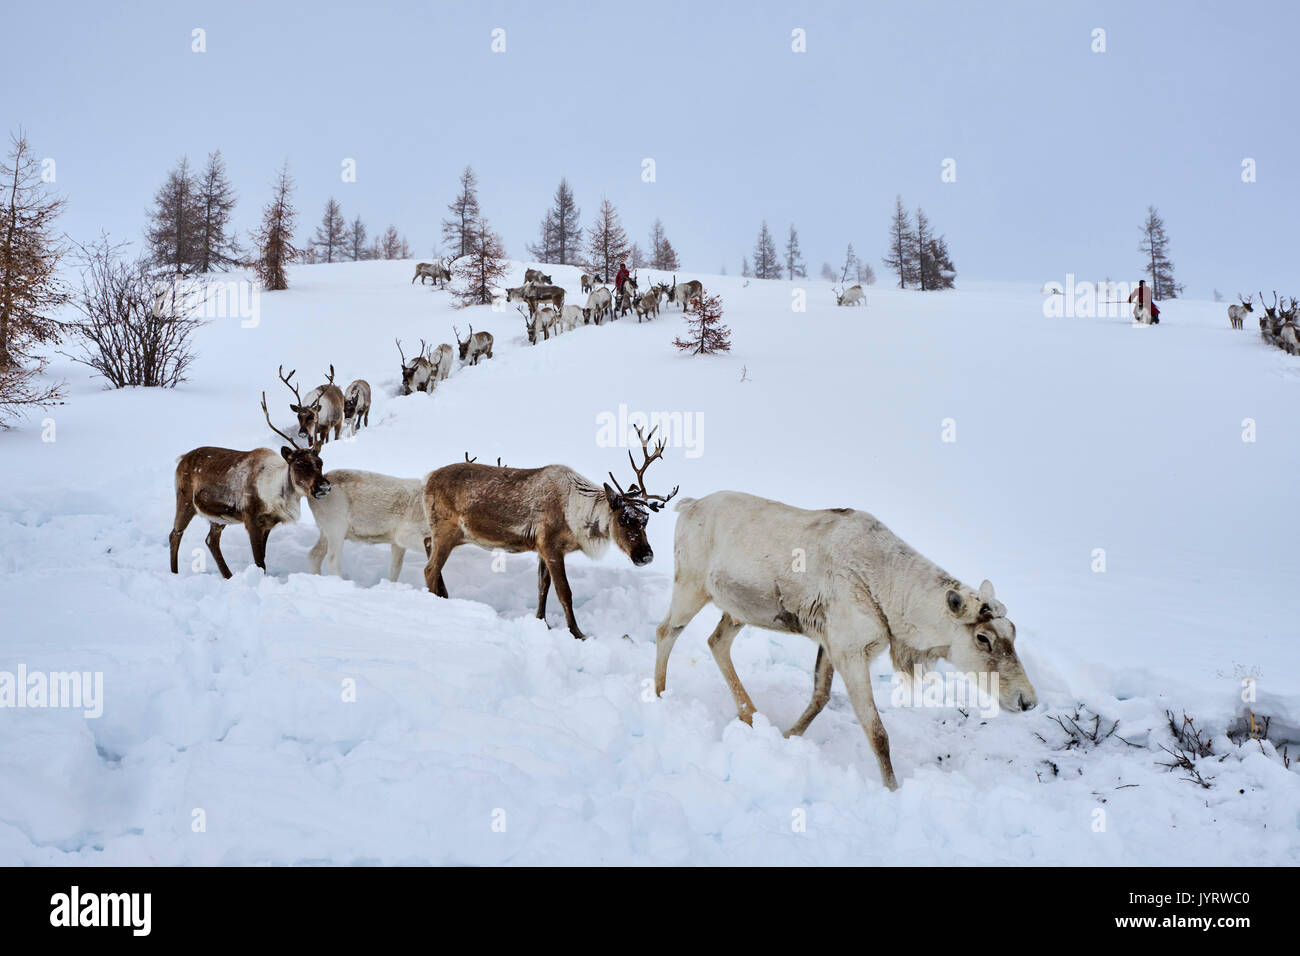 Mongolia, Khovsgol privince, the Tsaatan, reindeer herder, winter migration Stock Photo